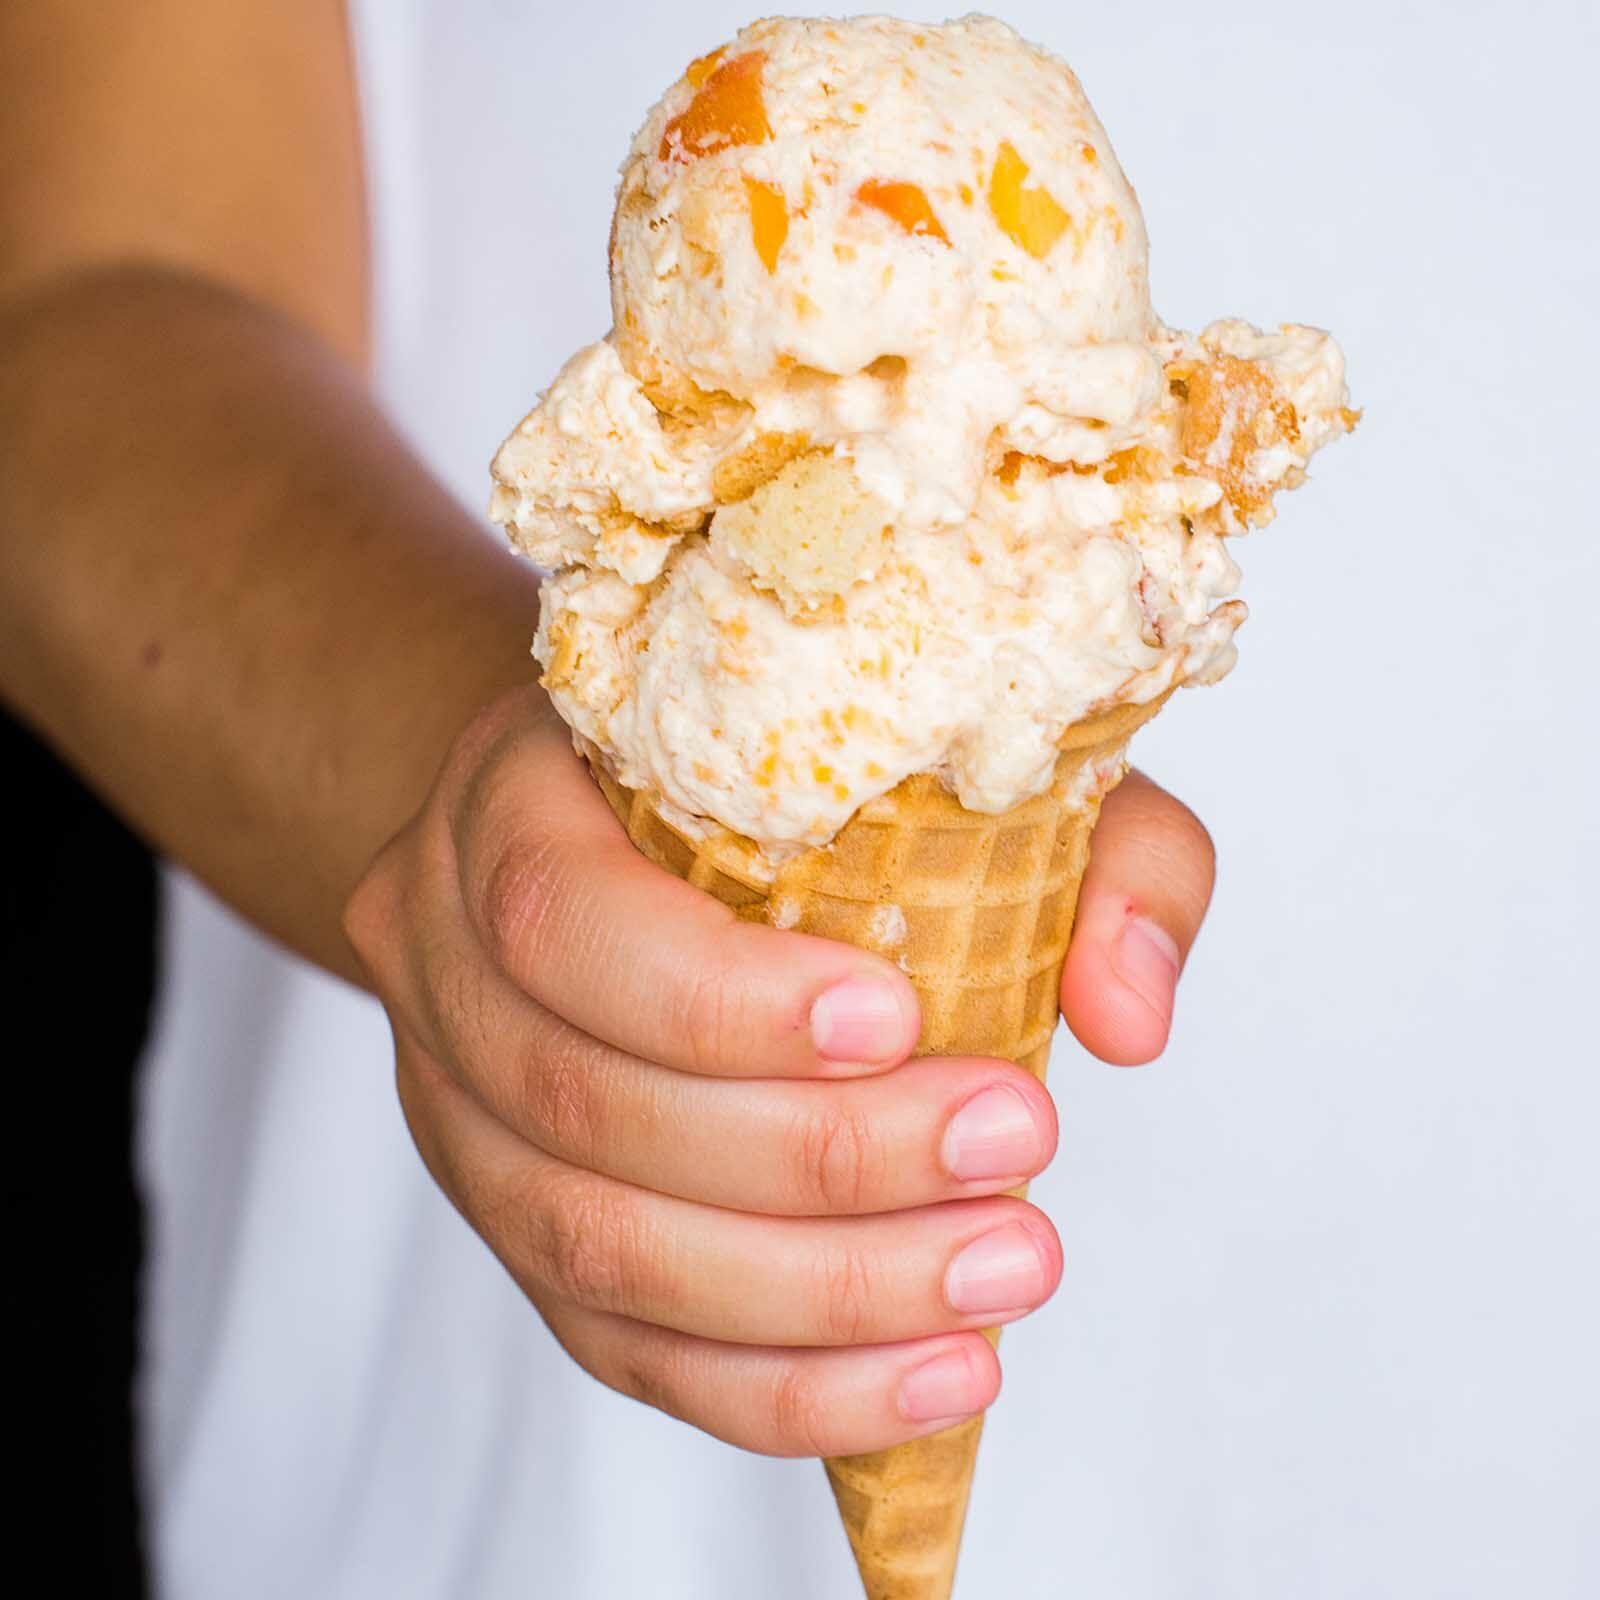 A hand holds a peach cobbler ice cream cone.